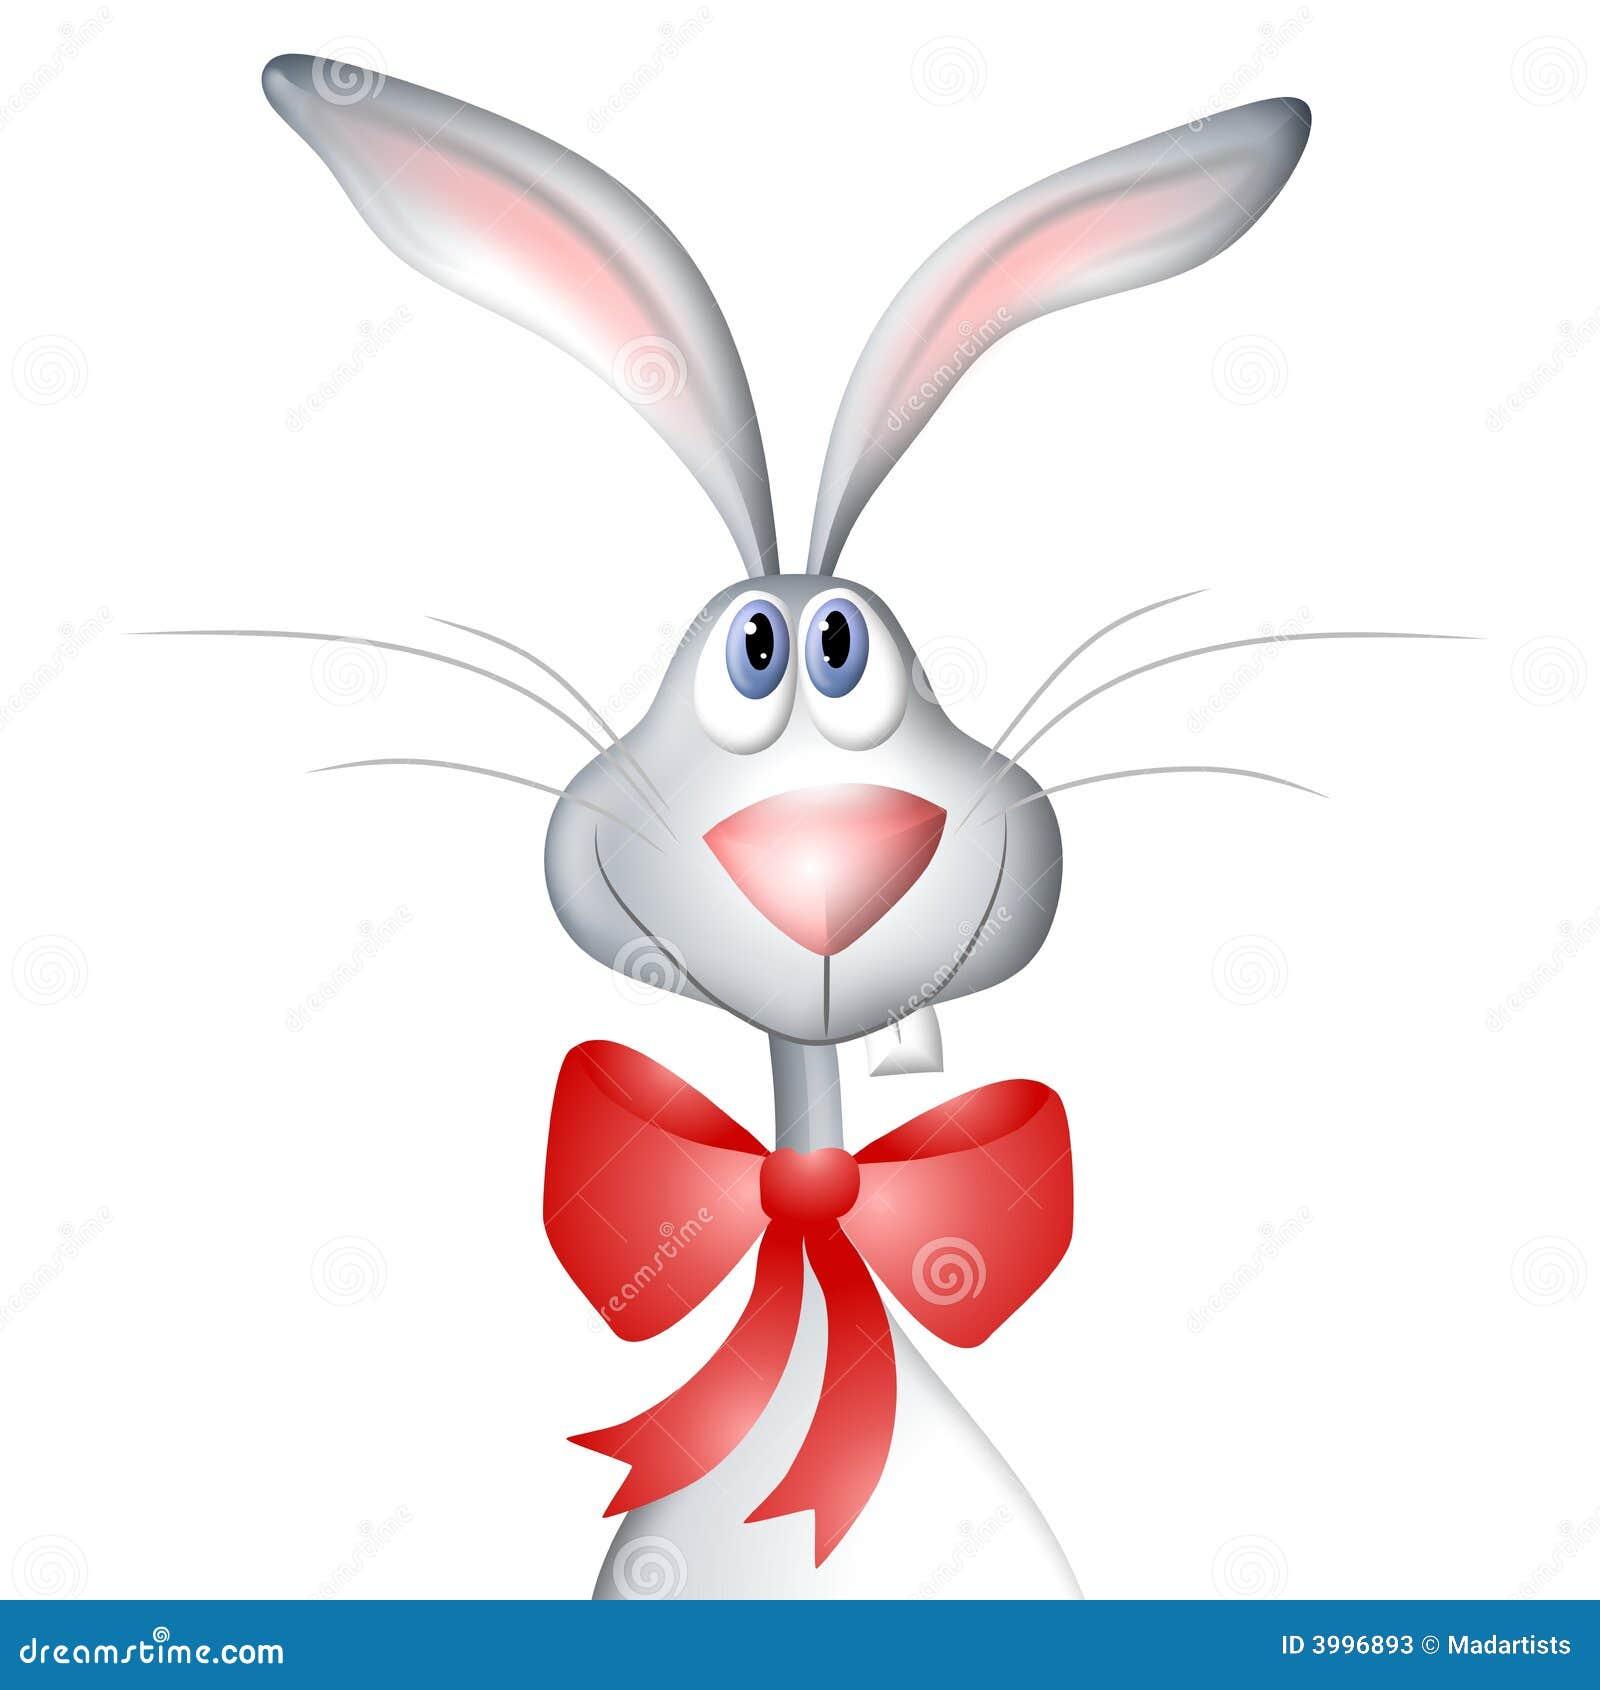 Cartoon Easter Bunny Rabbit Wearing Bow